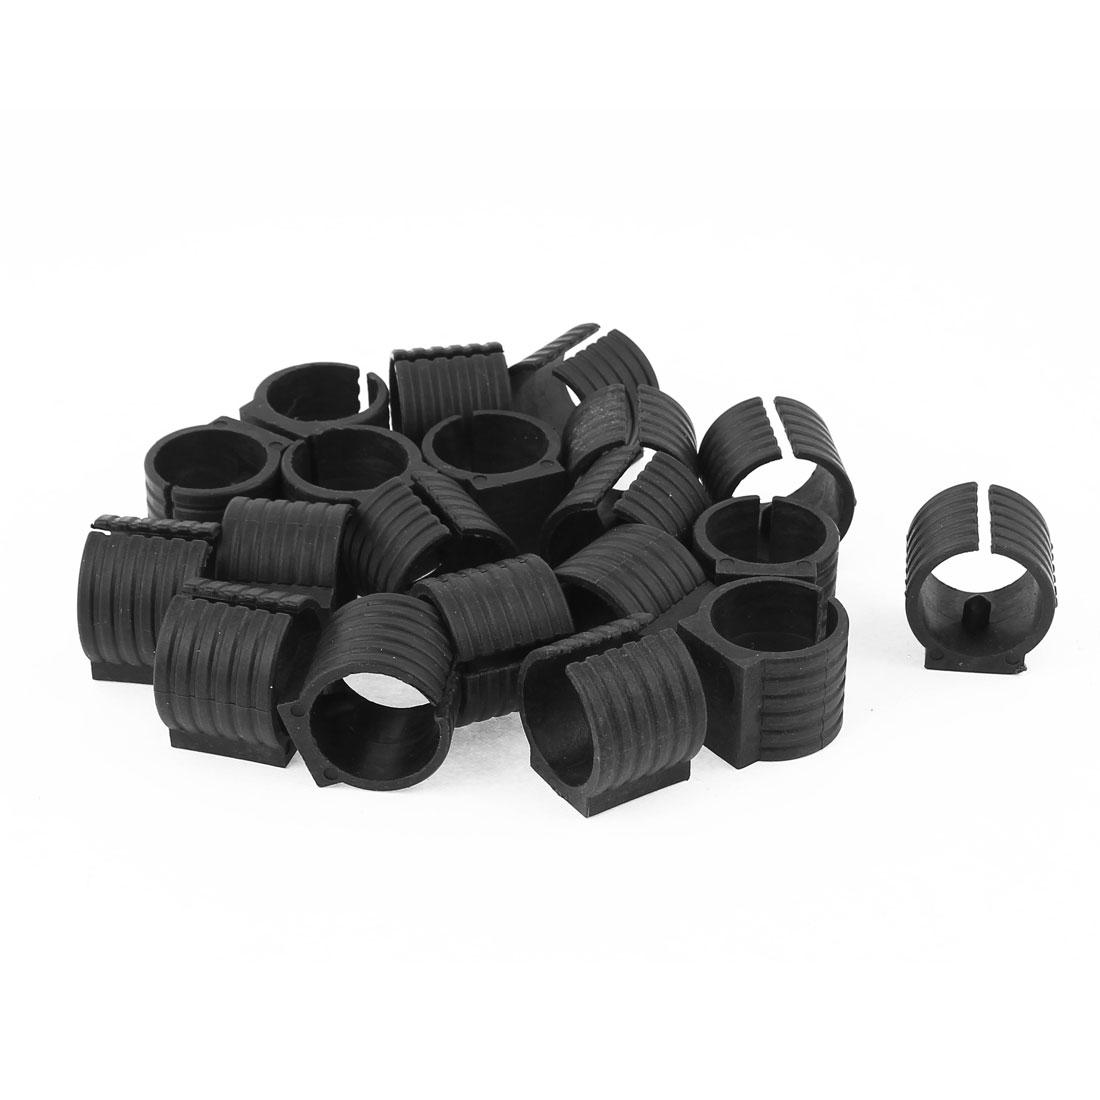 Chair Pipe Clamp Foot Pads Floor Glides U-Shape Caps 20pcs Black